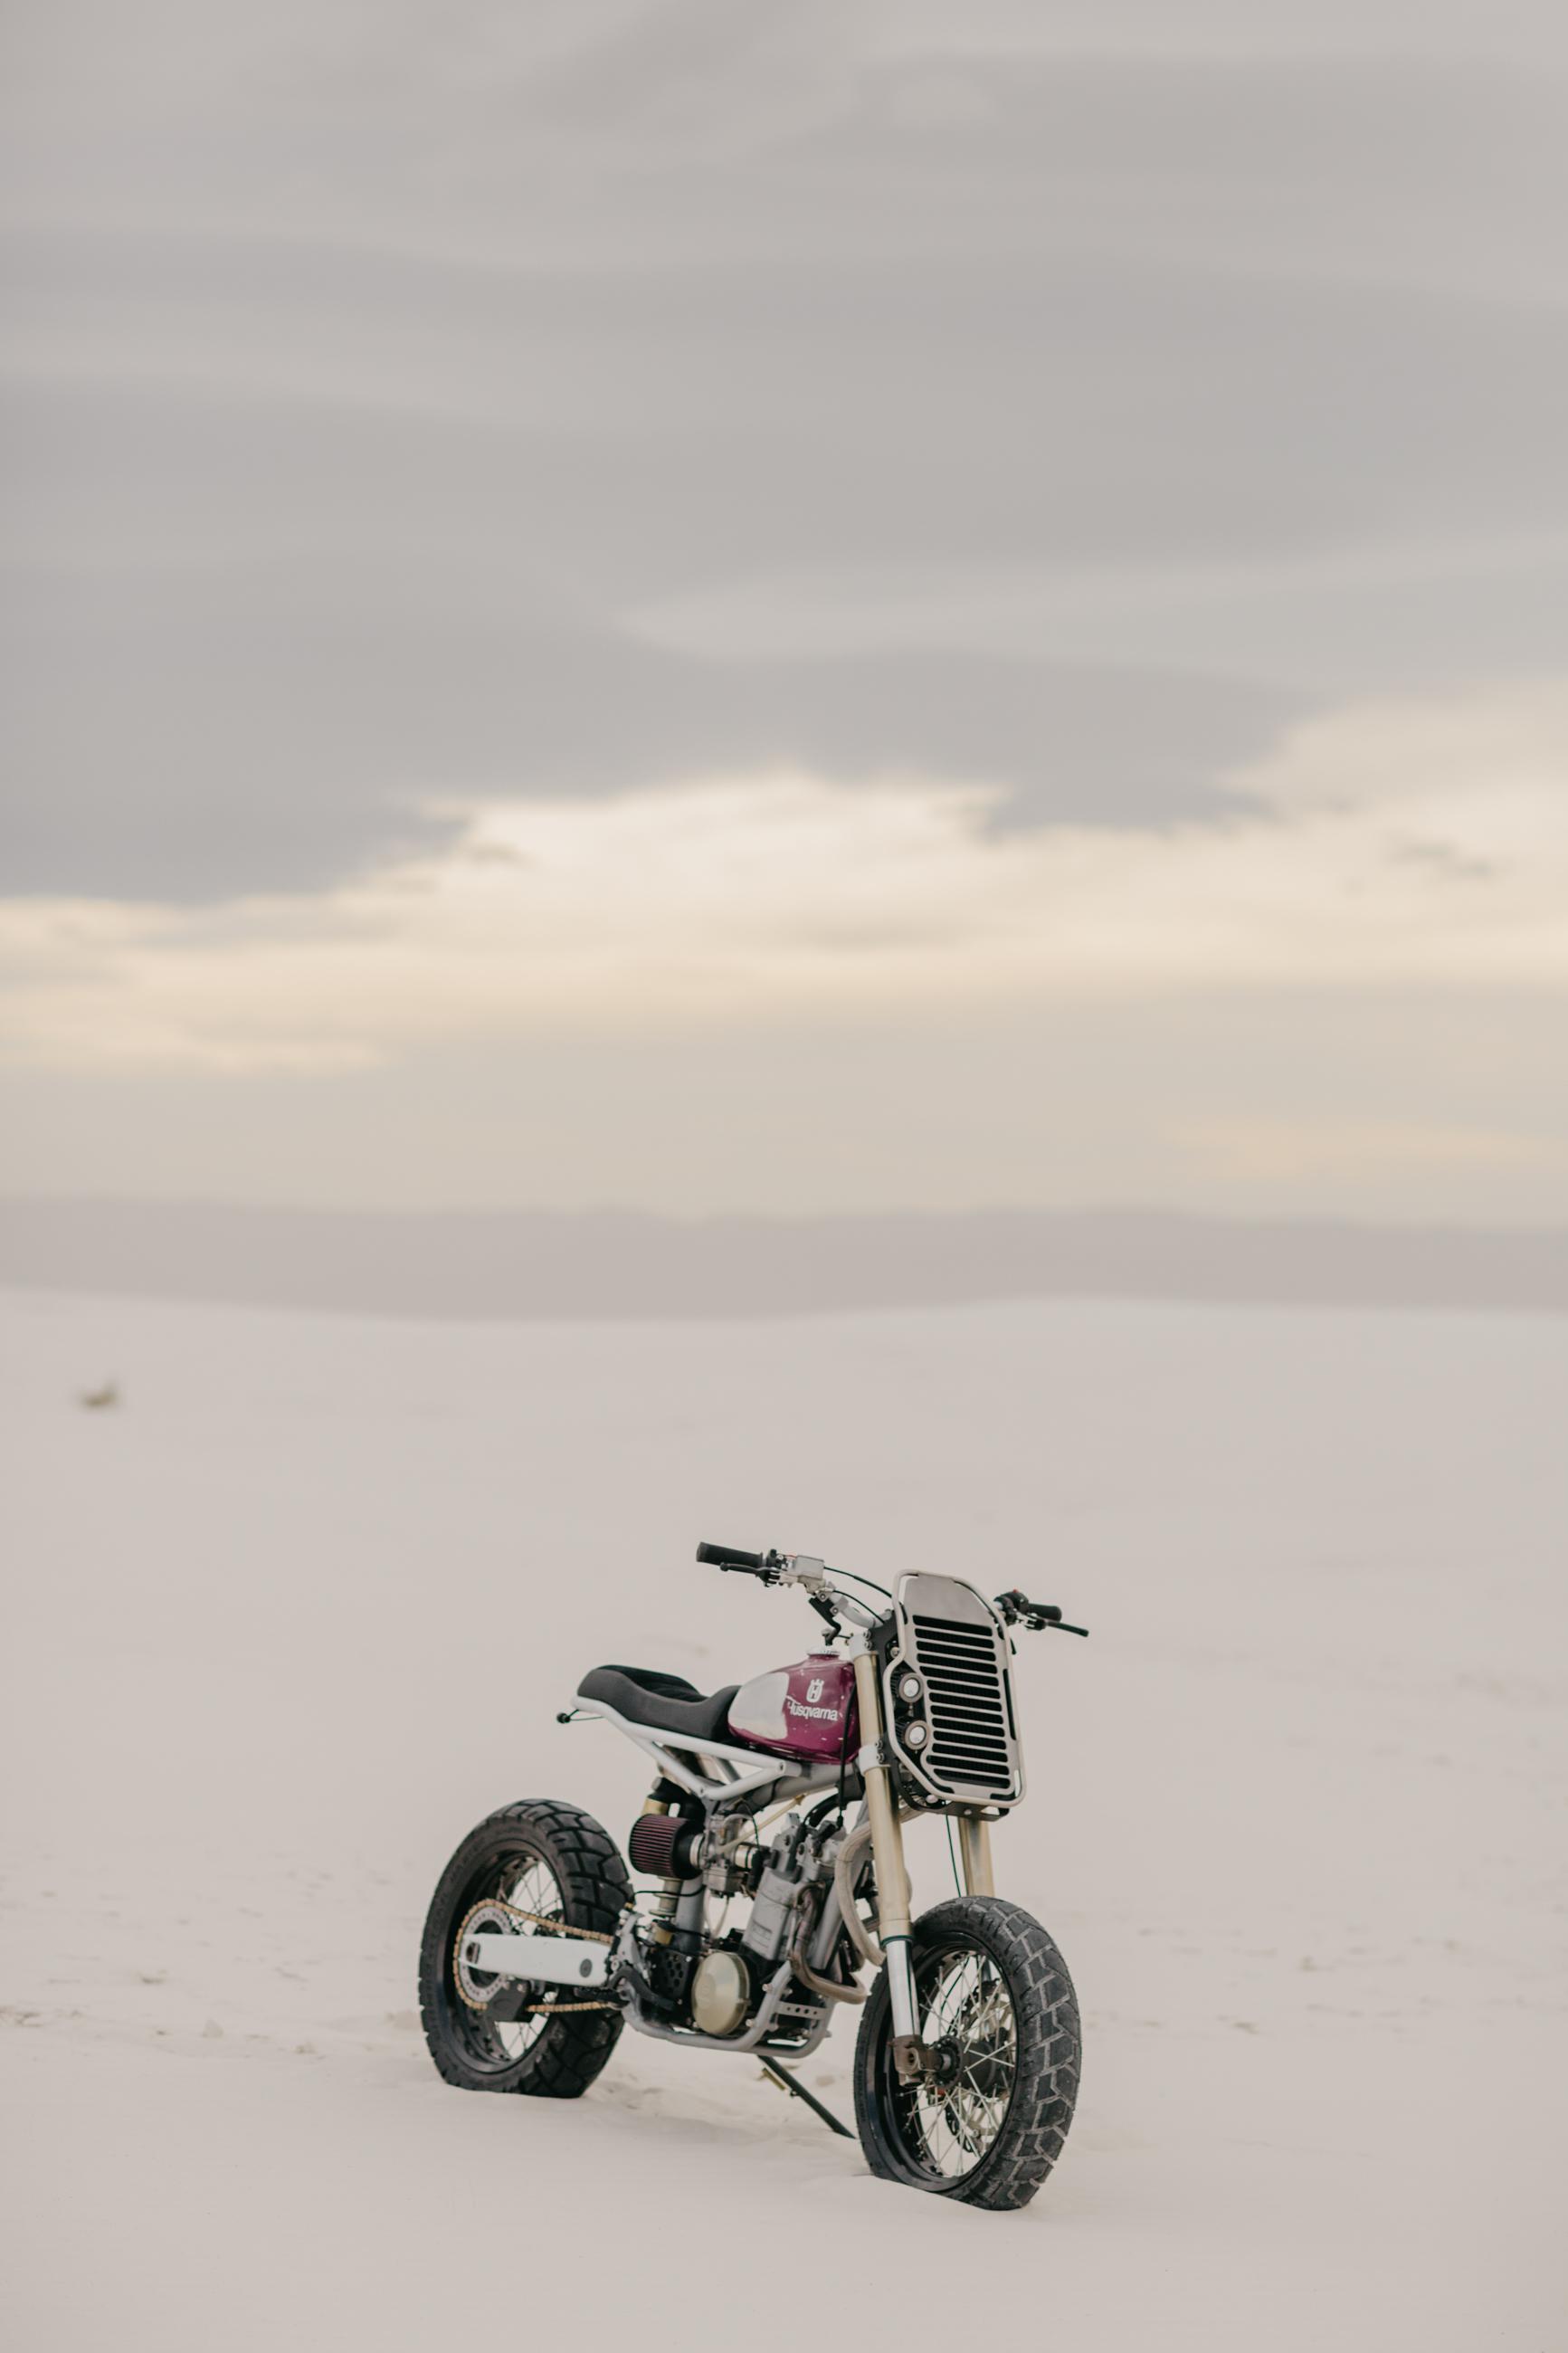 Moto-Mucci_Husqvarna_570_White_Sands (3).JPG